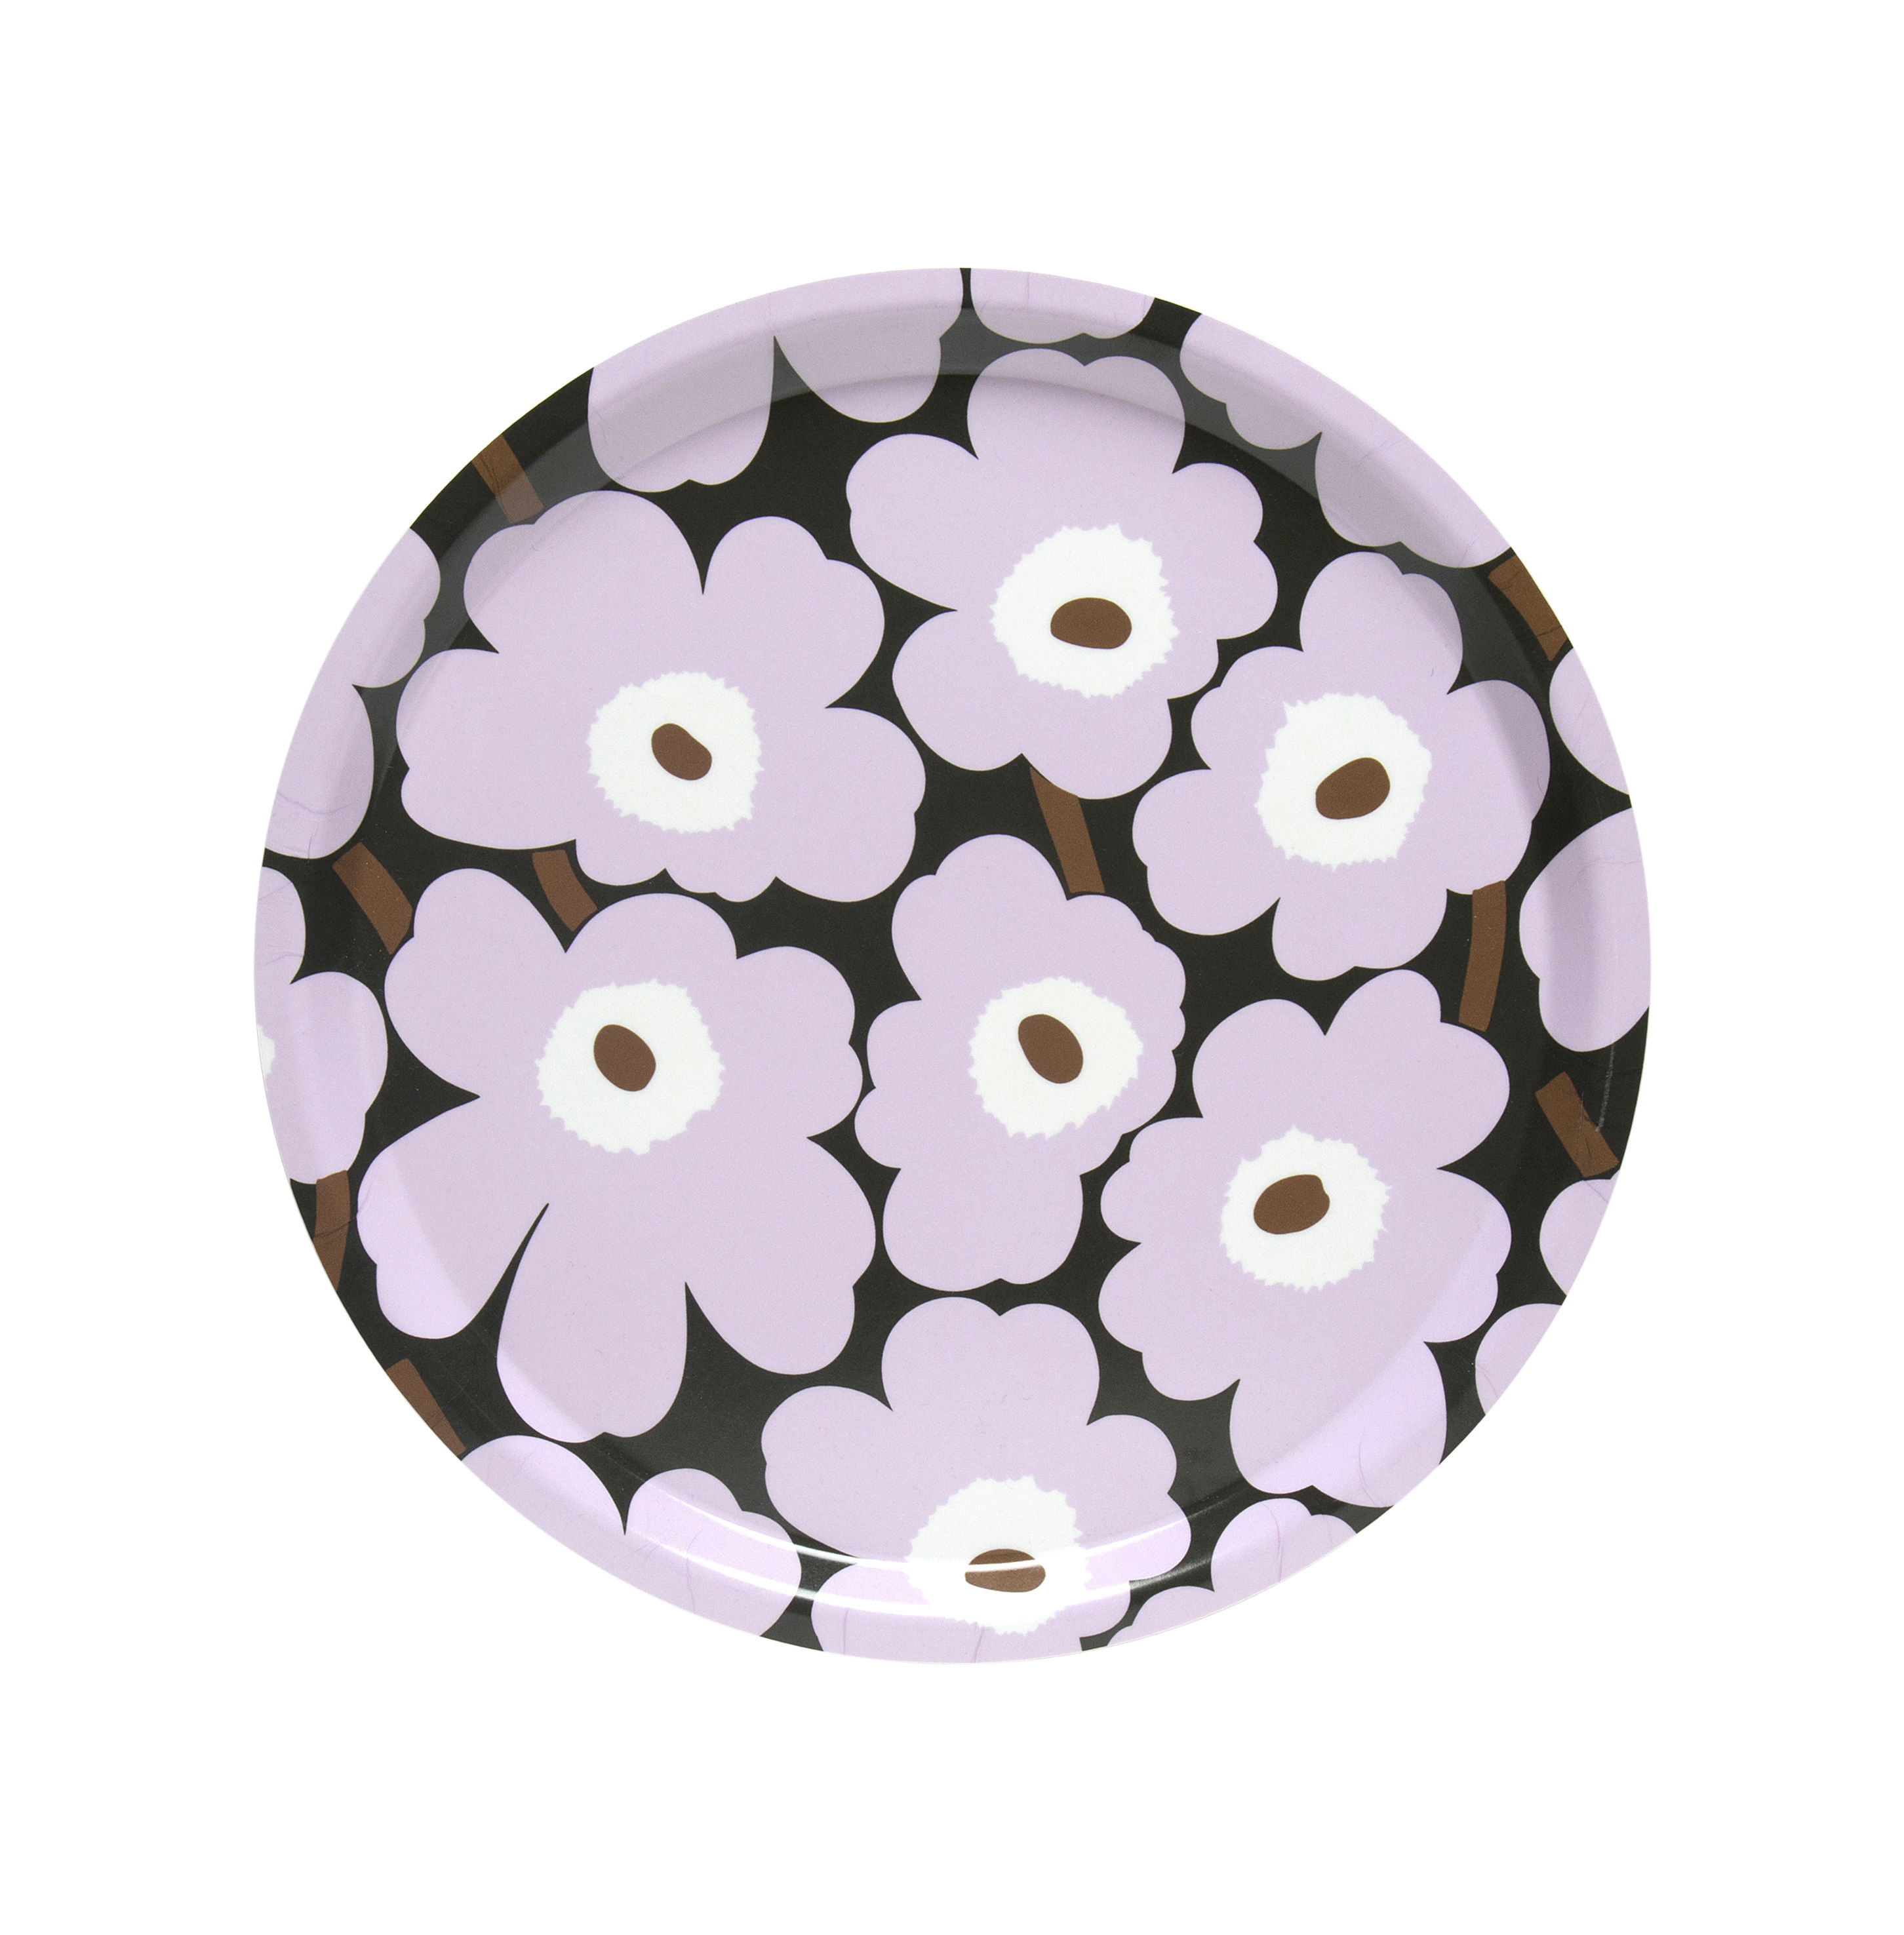 Tavola - Vassoi  - Piano/vassoio Mini Unikko - / Ø 31 cm di Marimekko - Mini Unikko / Rosa, Verde scuro - Laminato di betulla